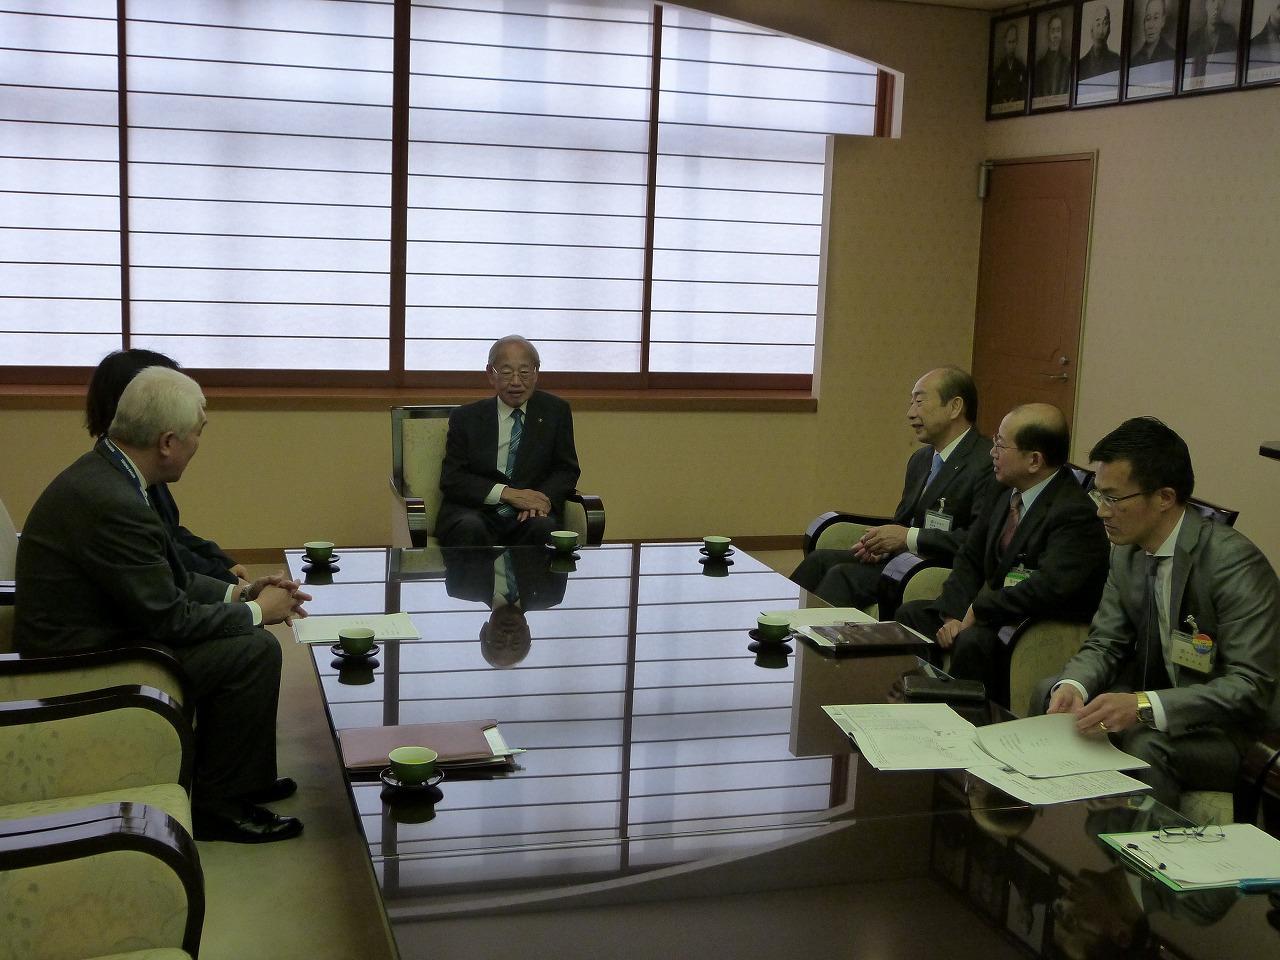 http://www.tohoku-gakuin.ac.jp/info/content/181205-2_1.jpg